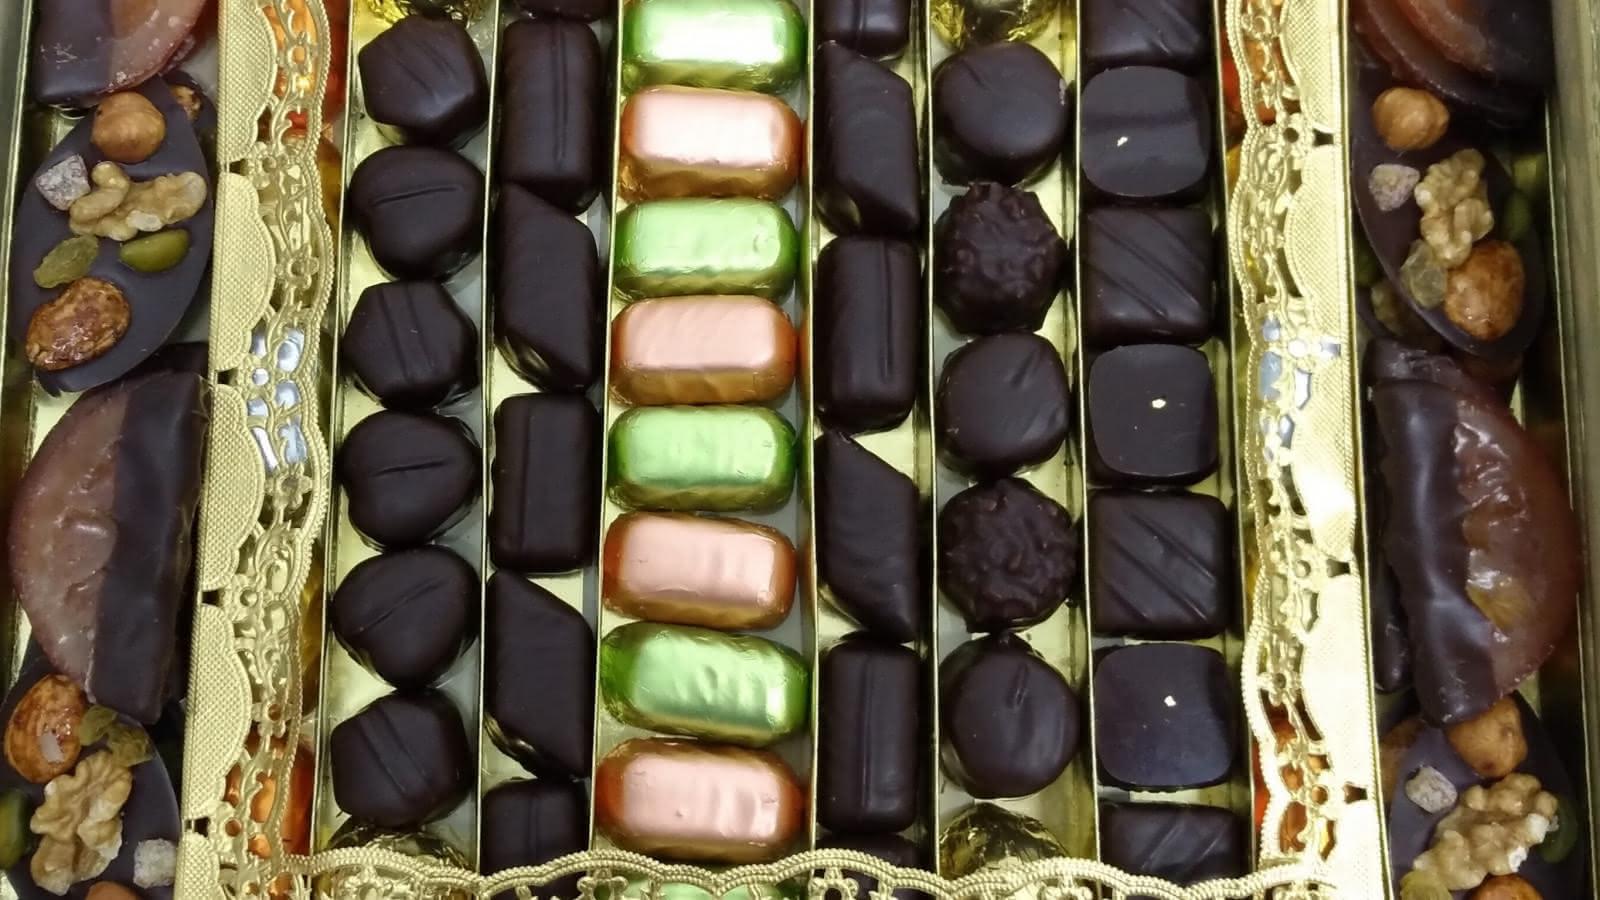 © Vieillard - Chocolatier confiseur